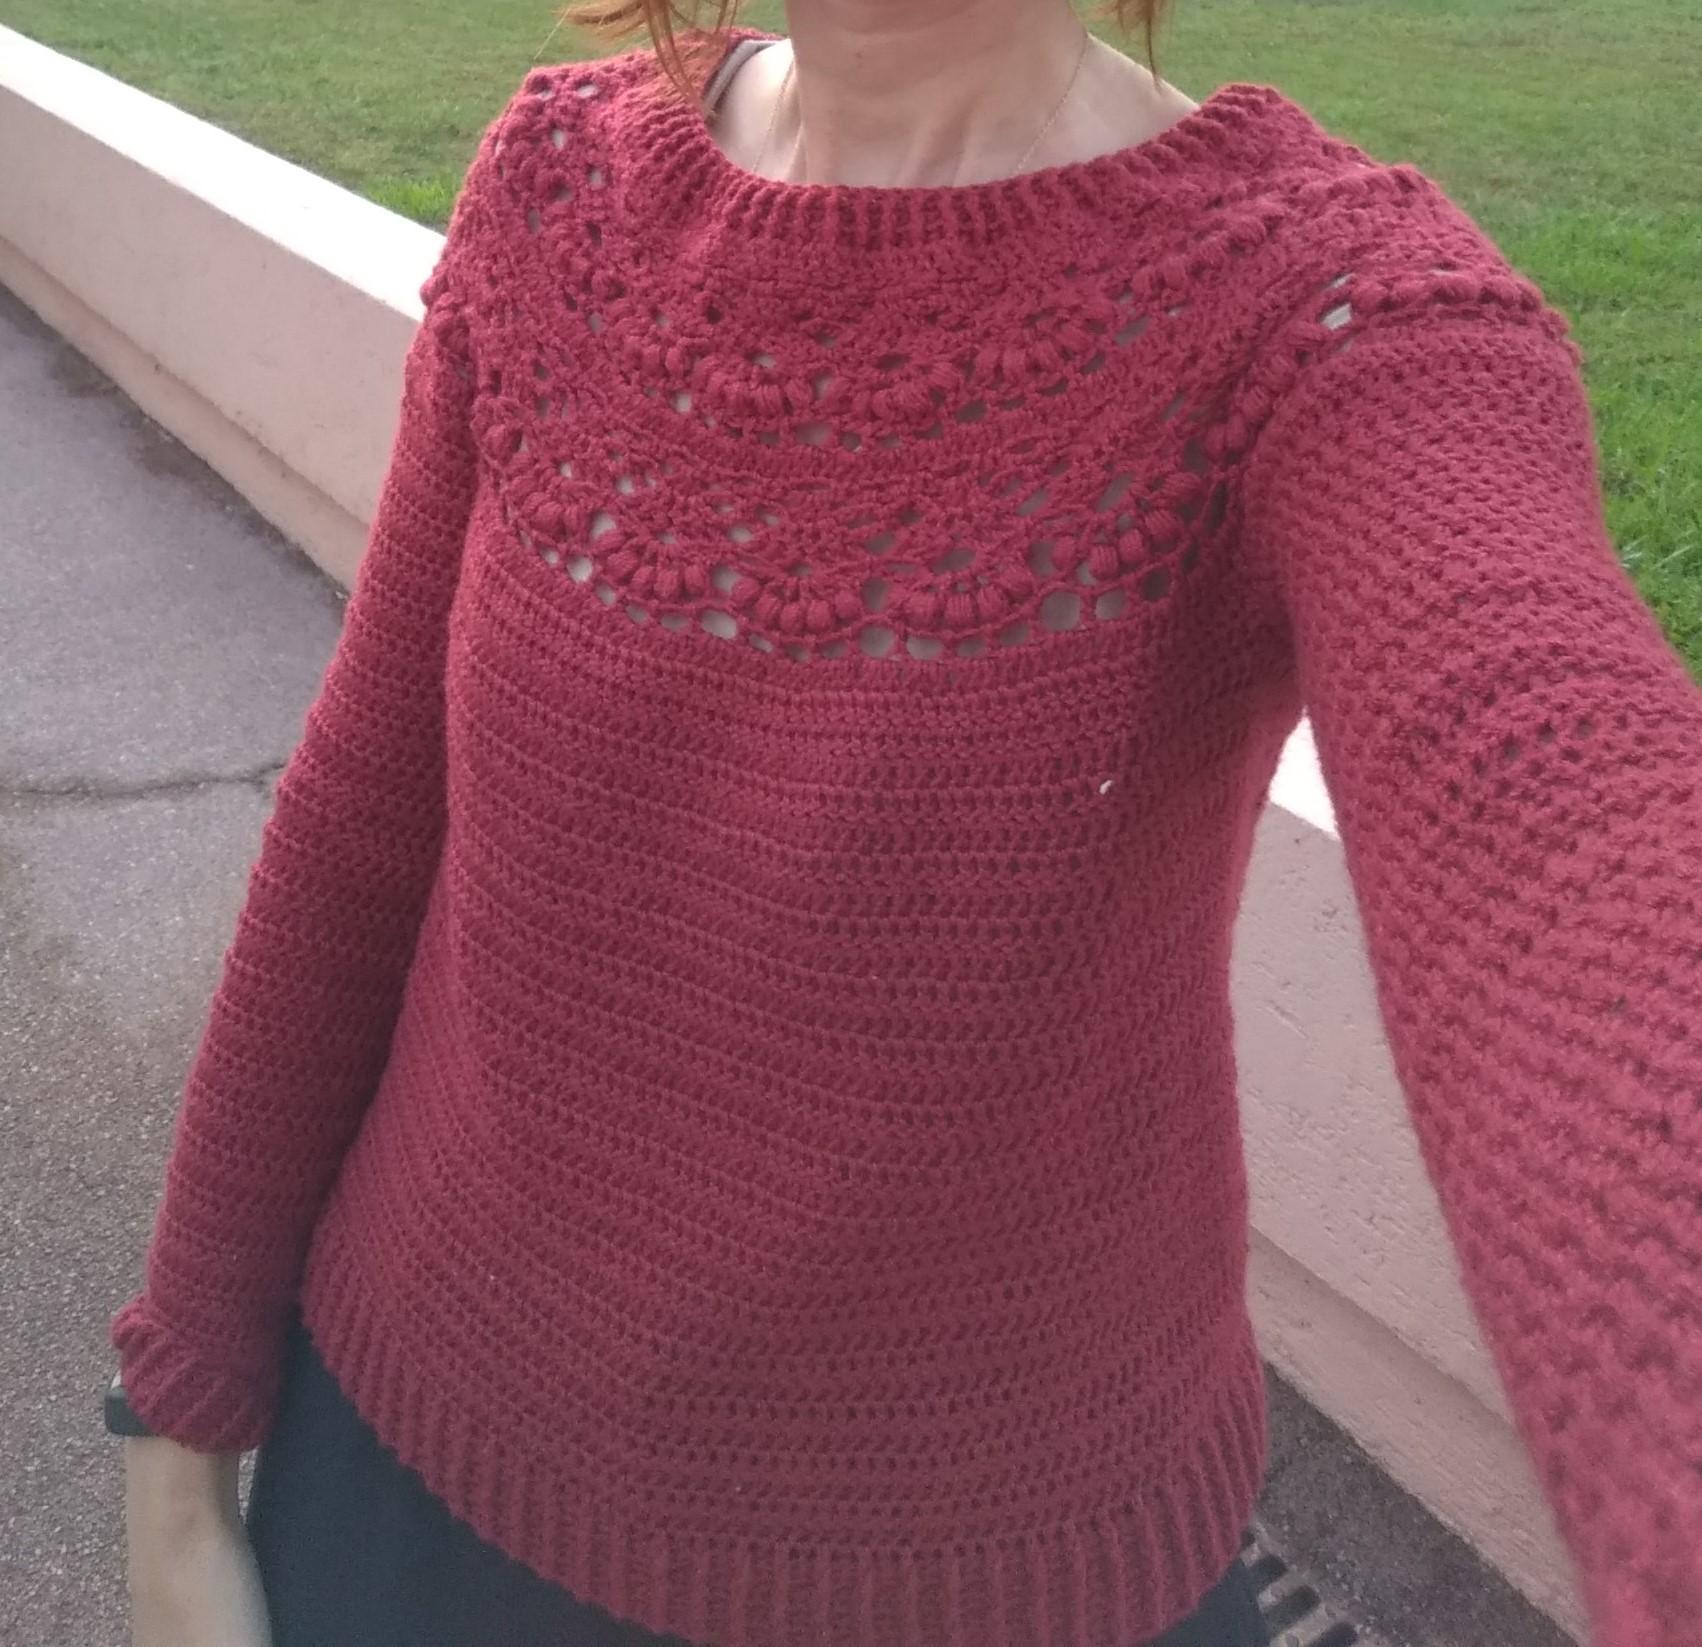 c76b7cdc6 Berry crochet sweater - top down round yoke - Silk   Wool